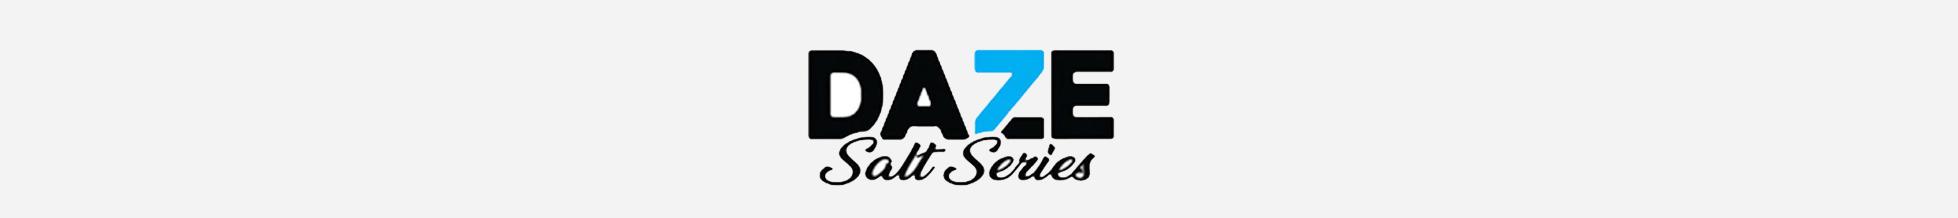 daze-reds-salt-.jpg